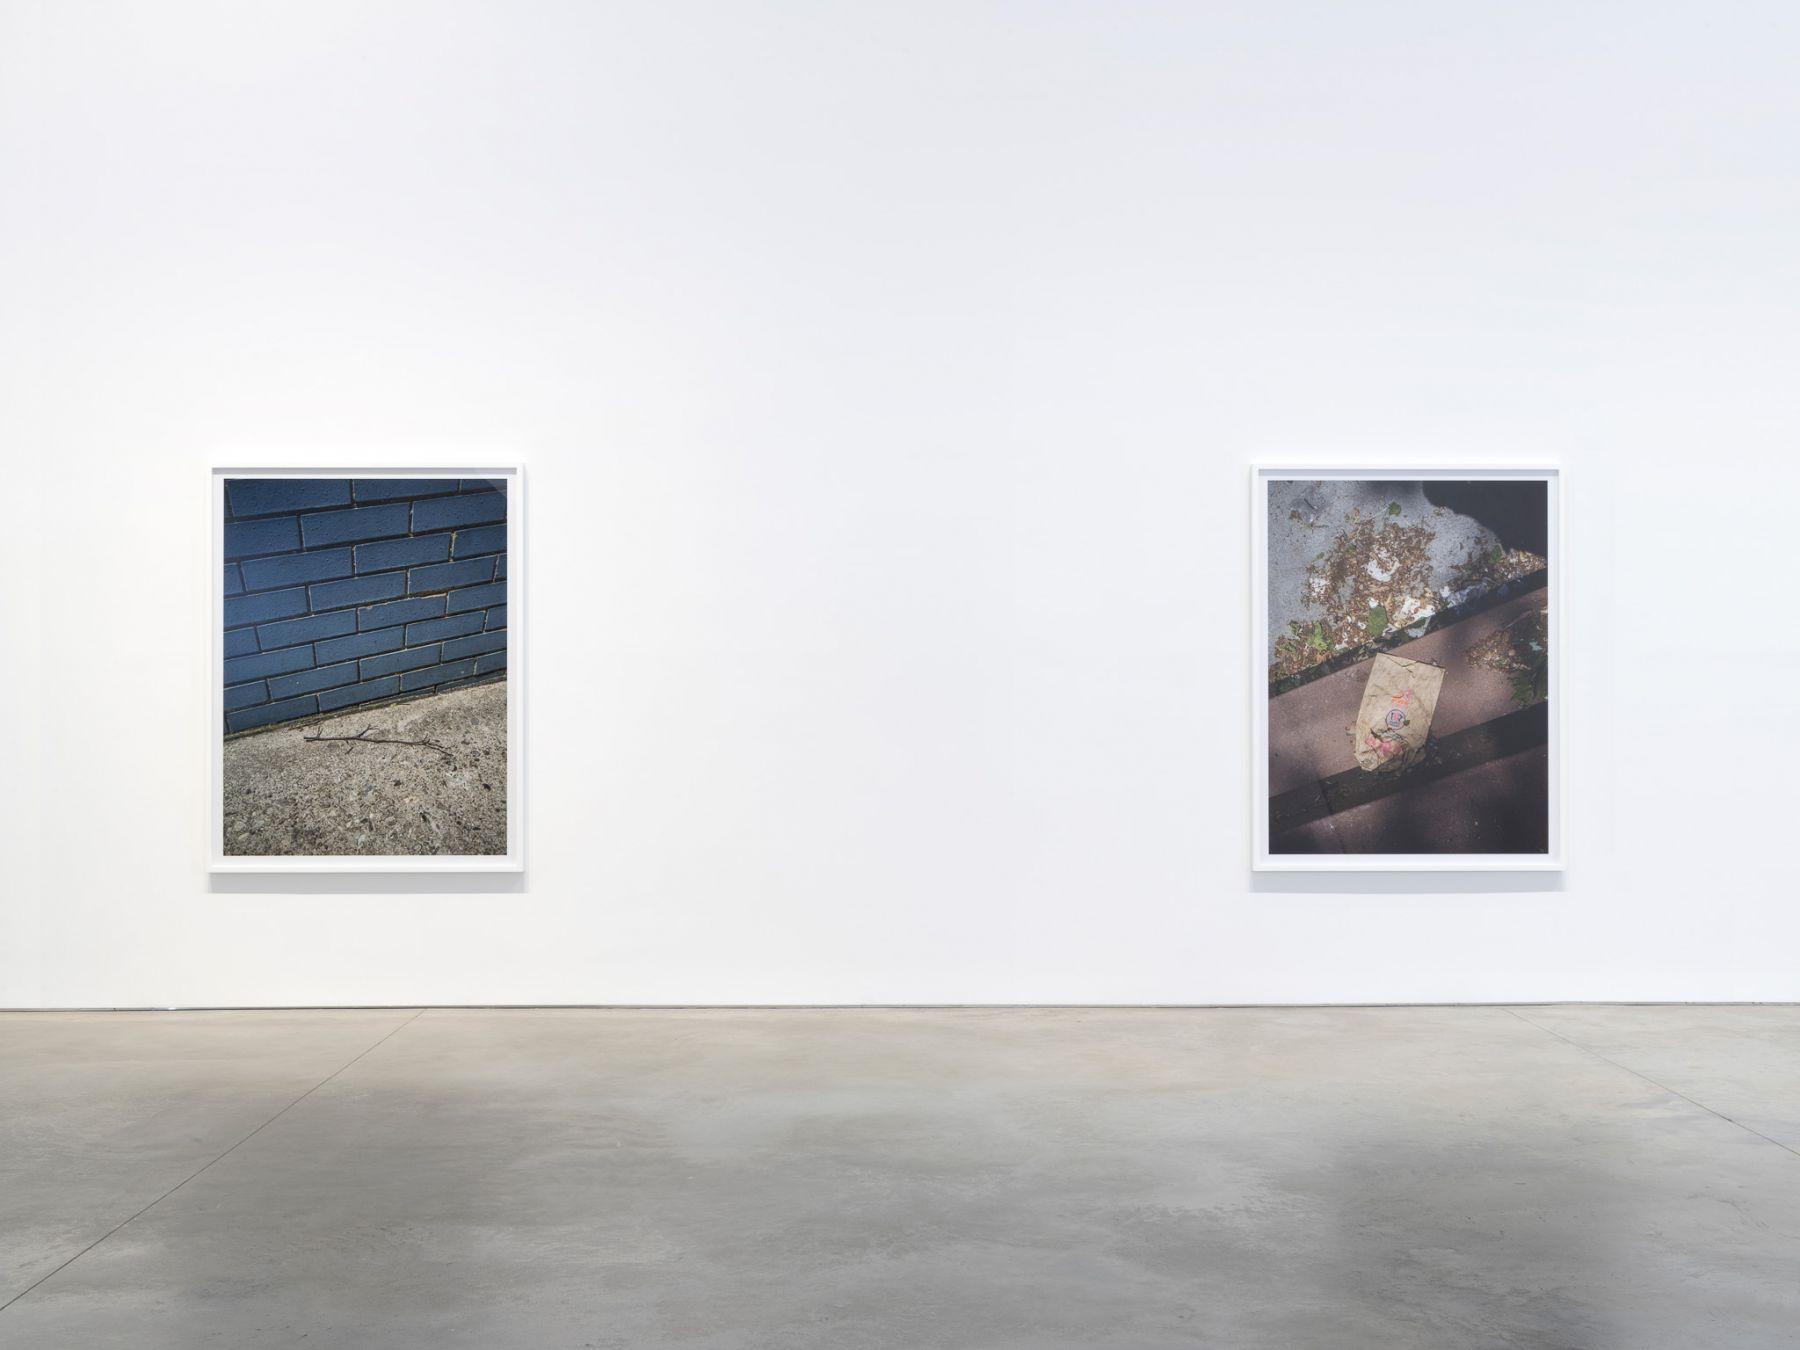 Installation view: Stephen Shore, 303 Gallery, New York, 2018